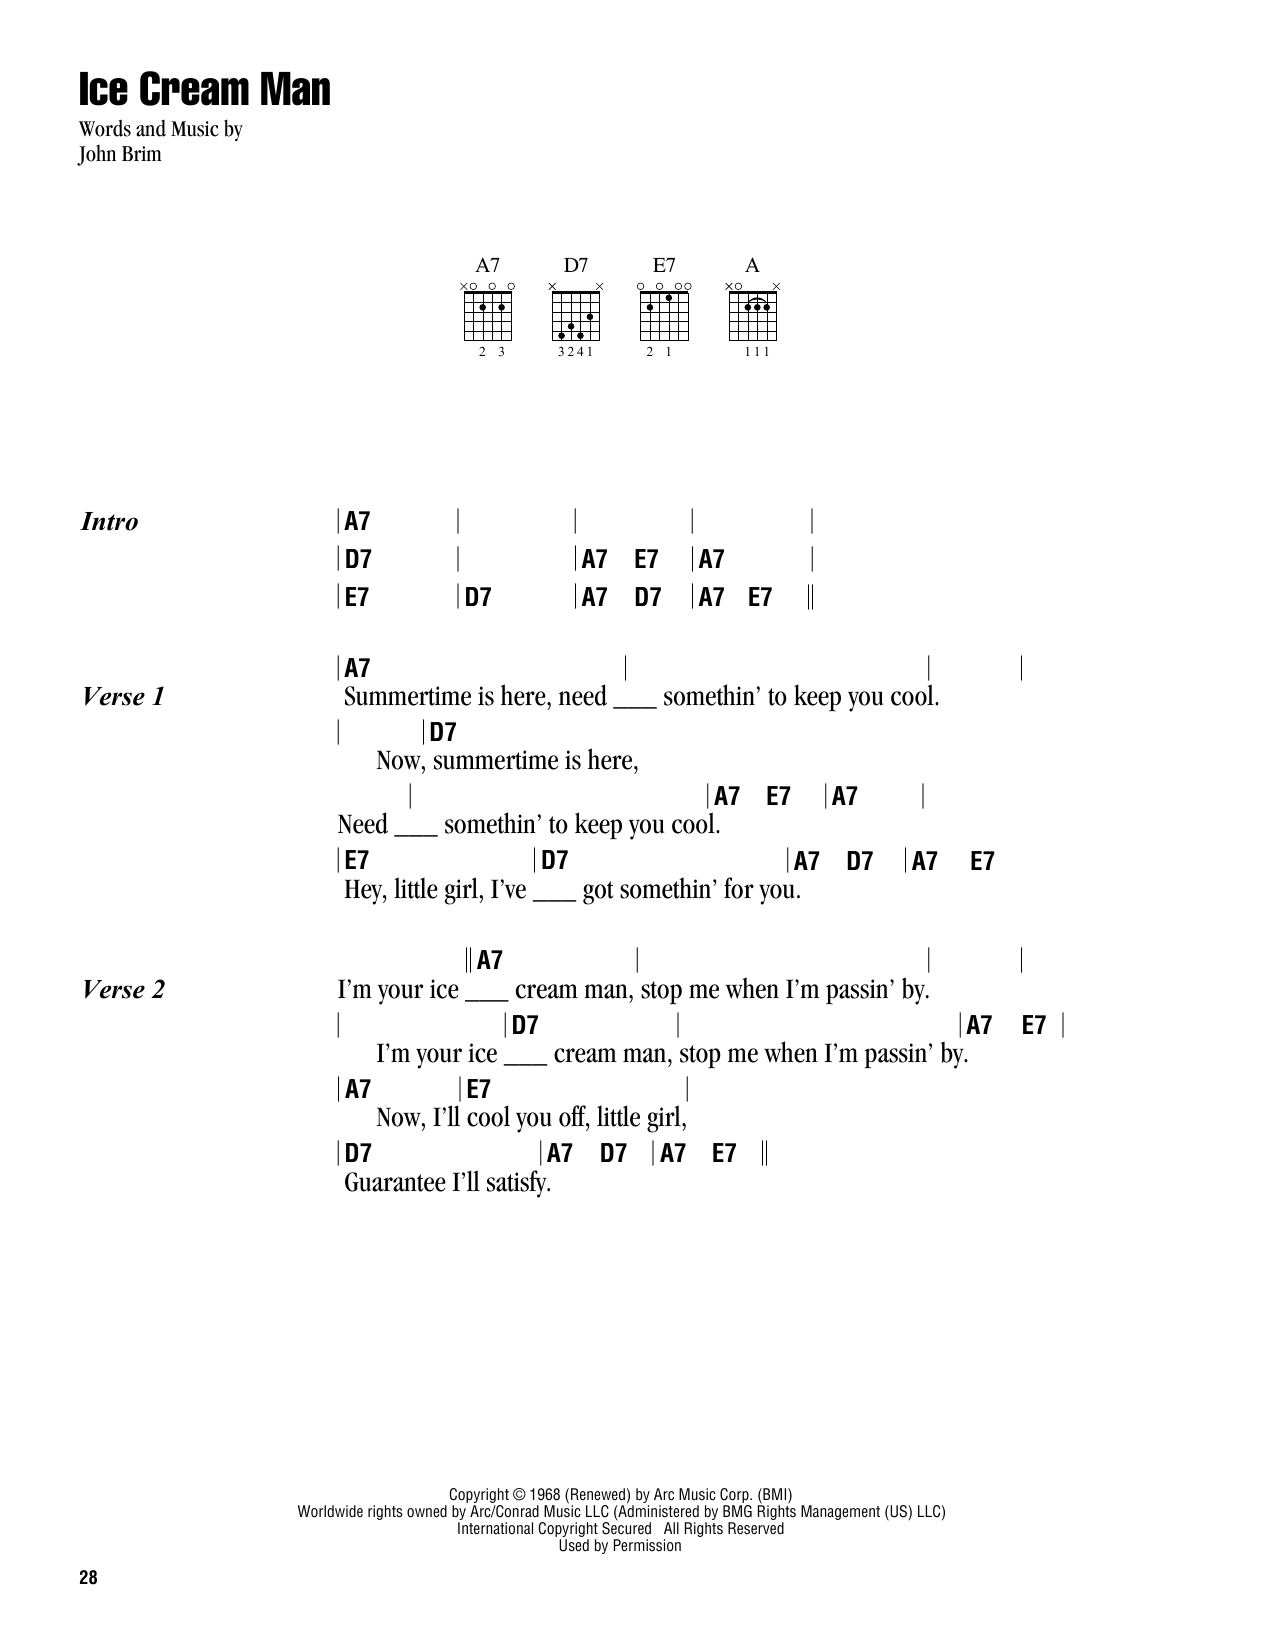 John Brim Ice Cream Man sheet music notes and chords